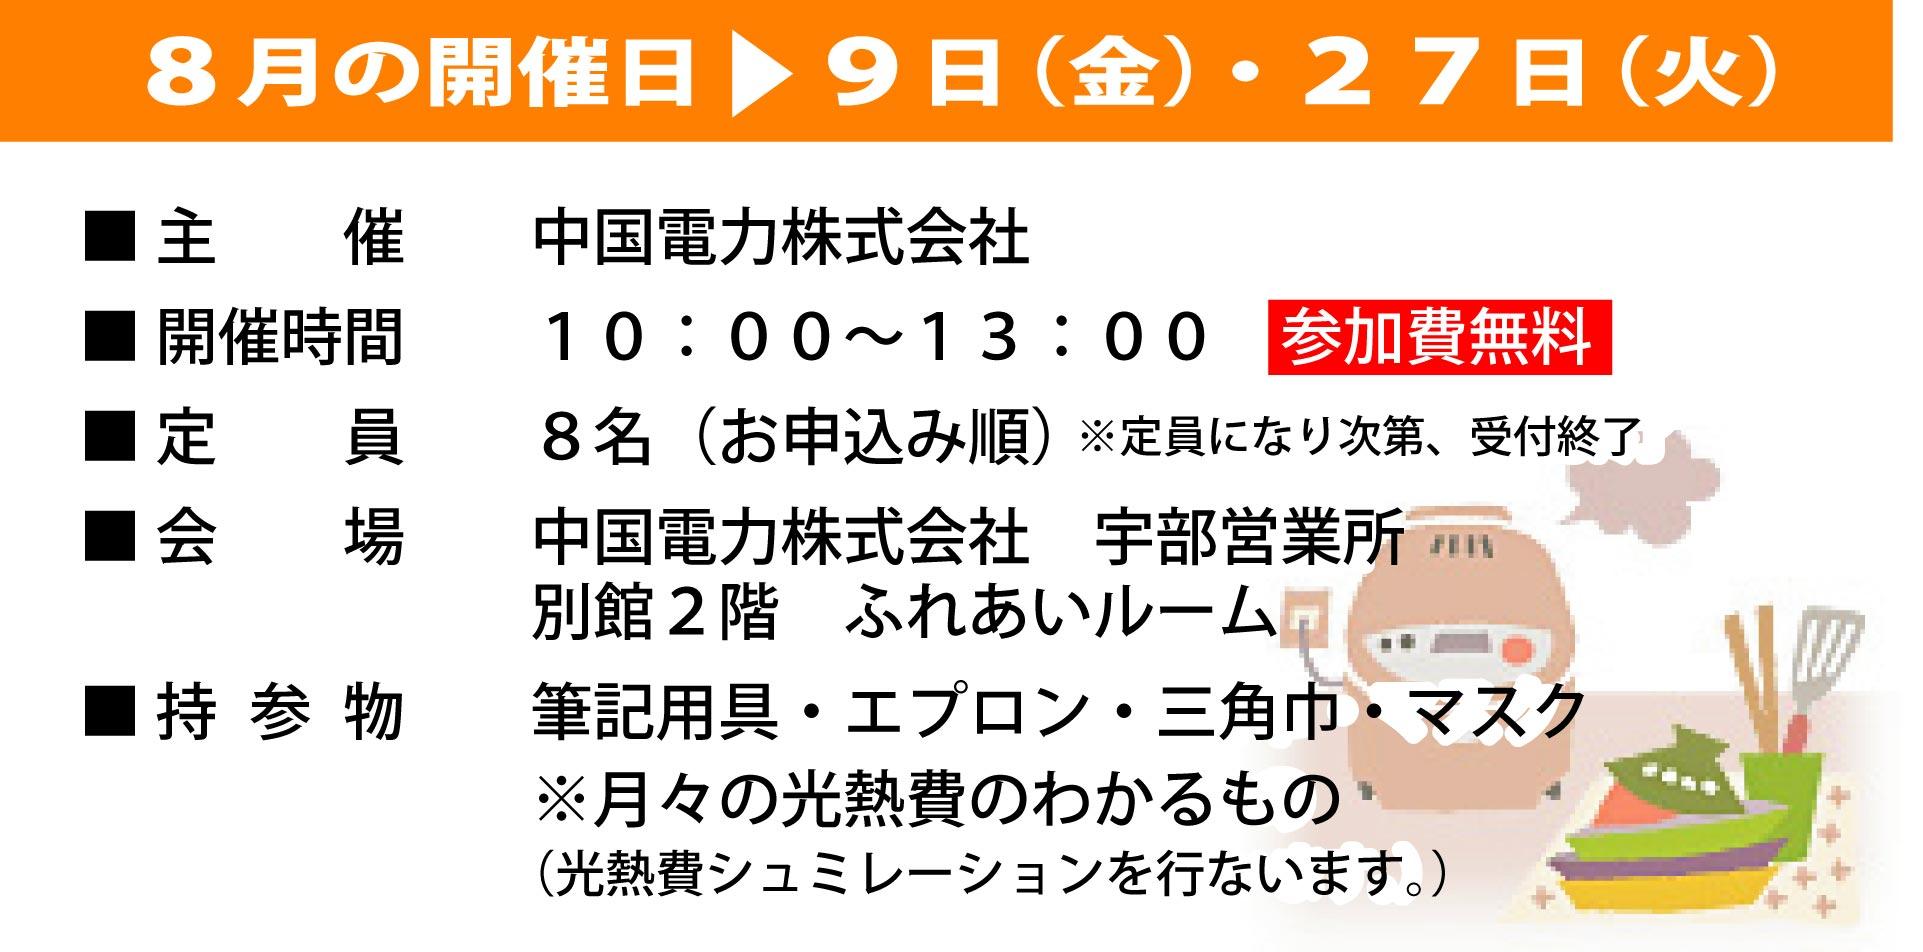 KuraSi-natu-sin74-13.jpg